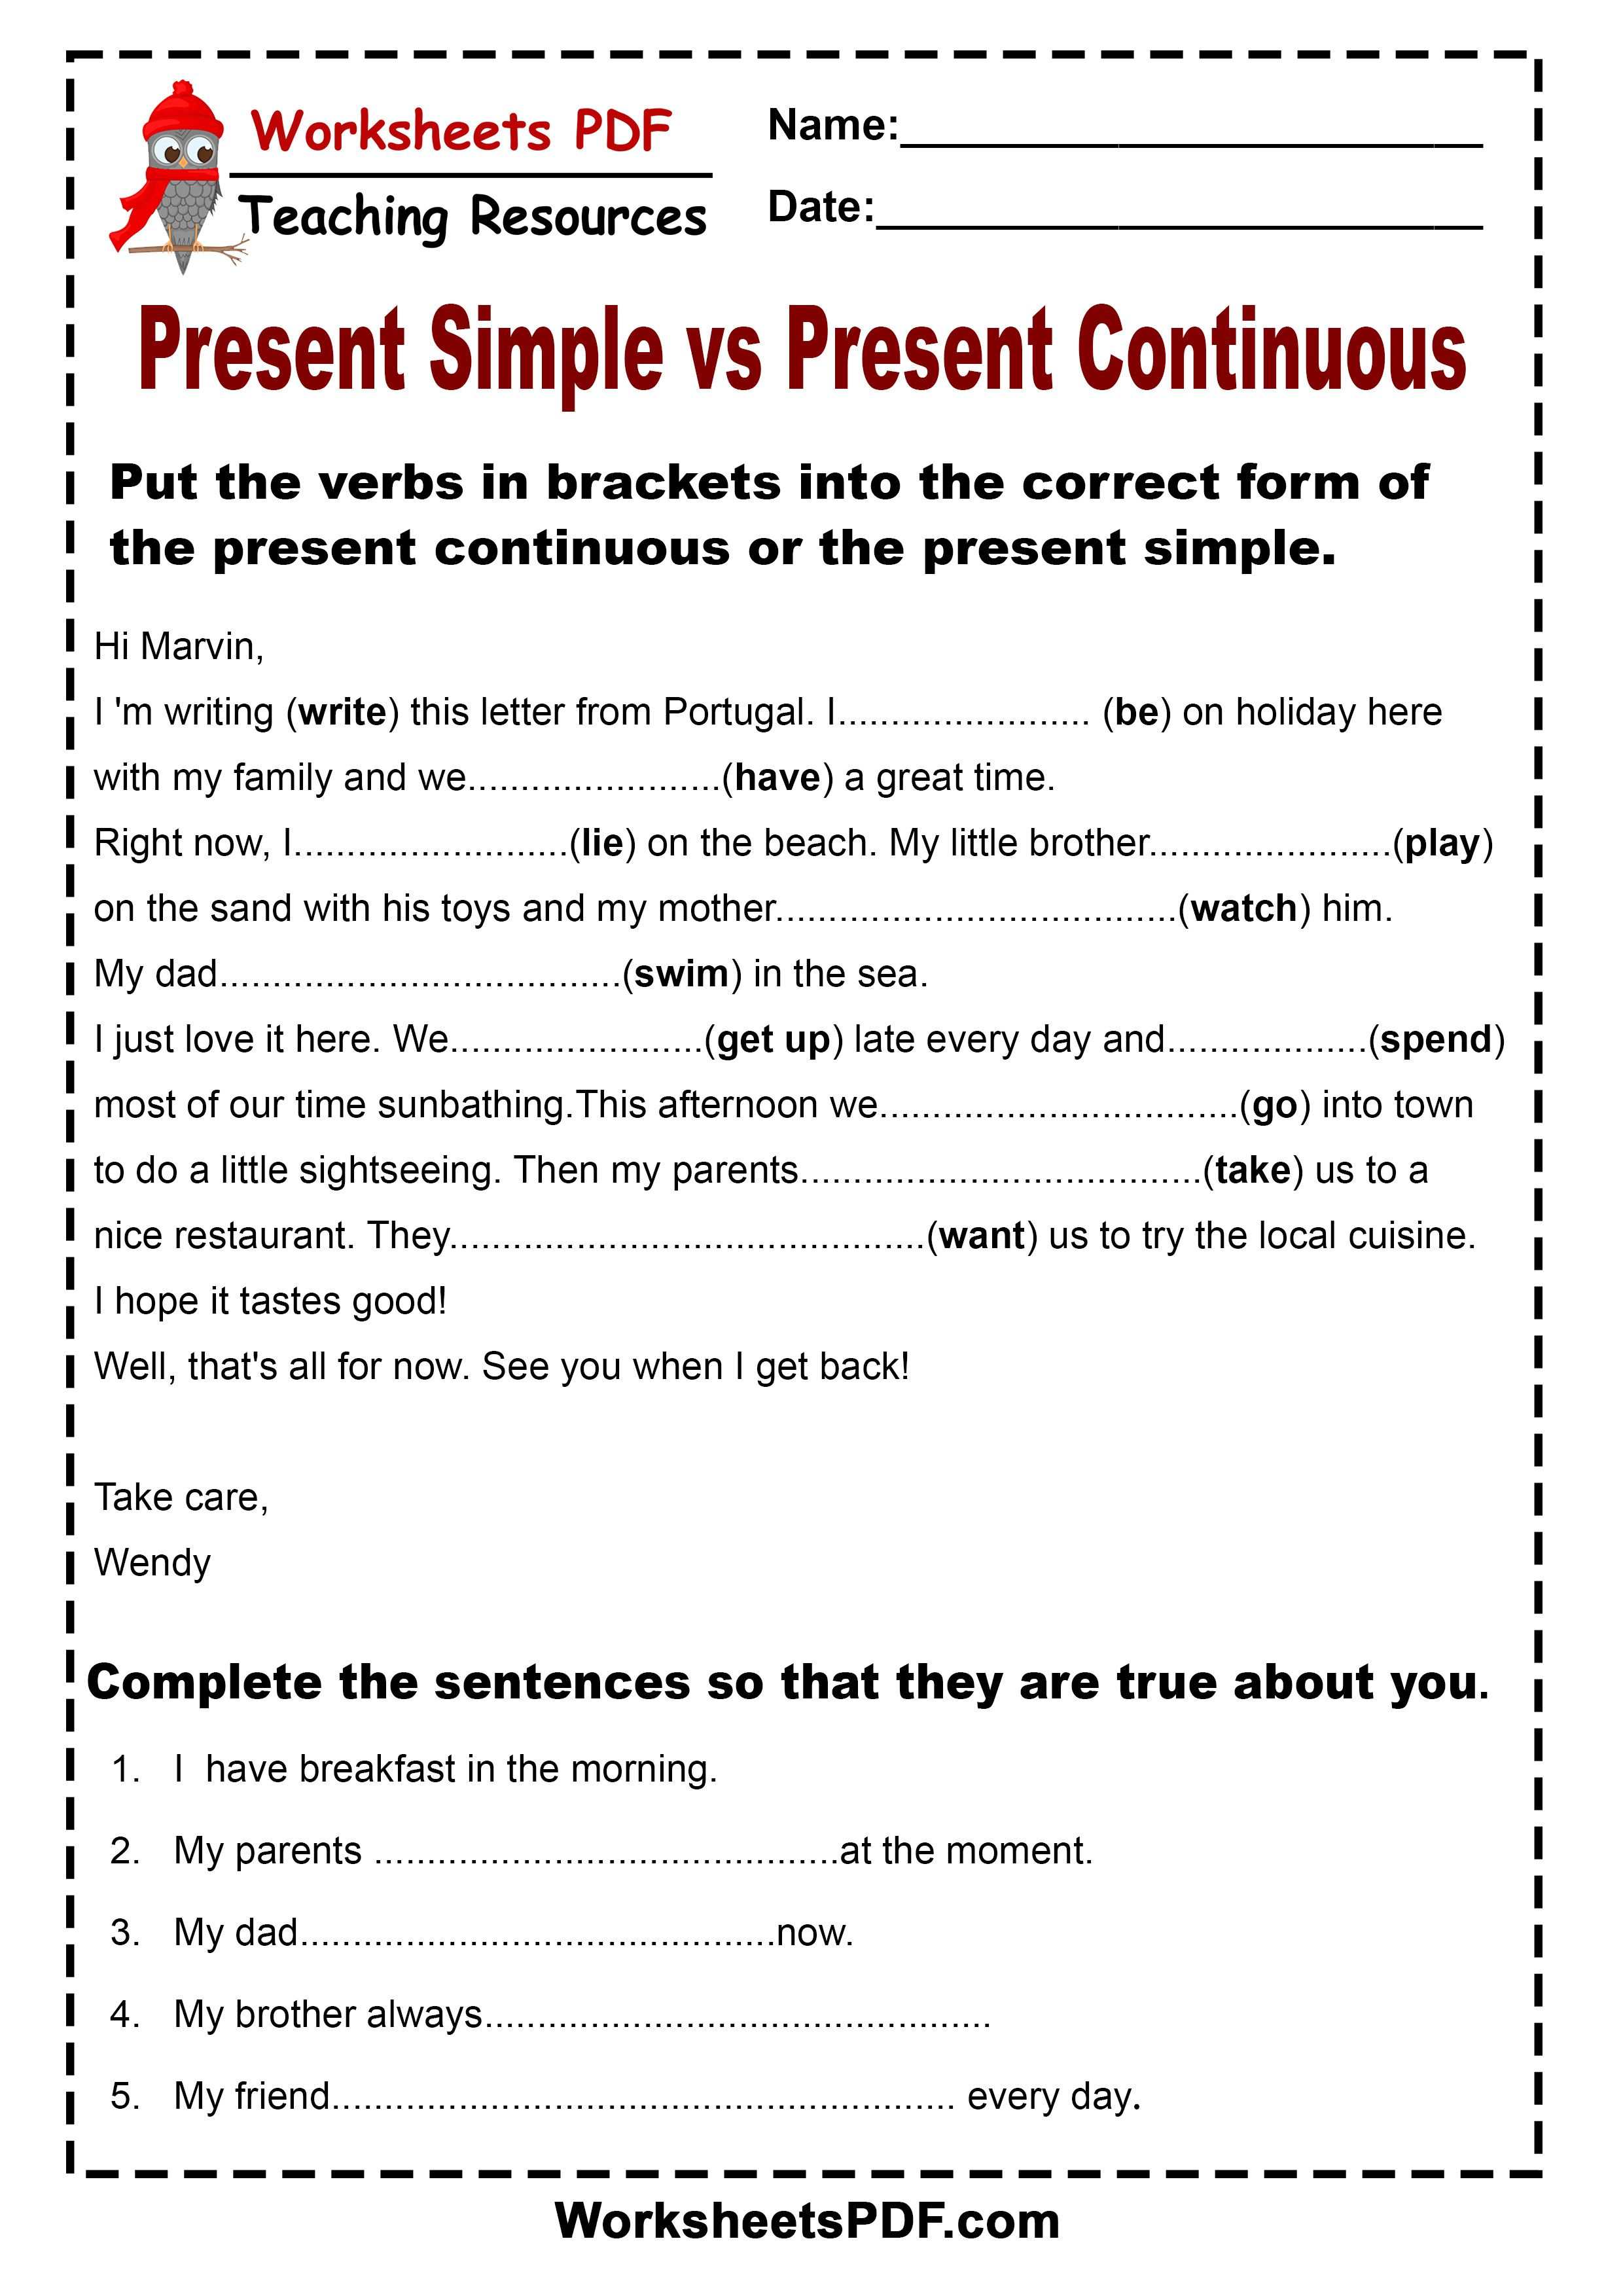 Present Simple Vs Present Continuous 3 English Grammar Exercises English Grammar Learn English